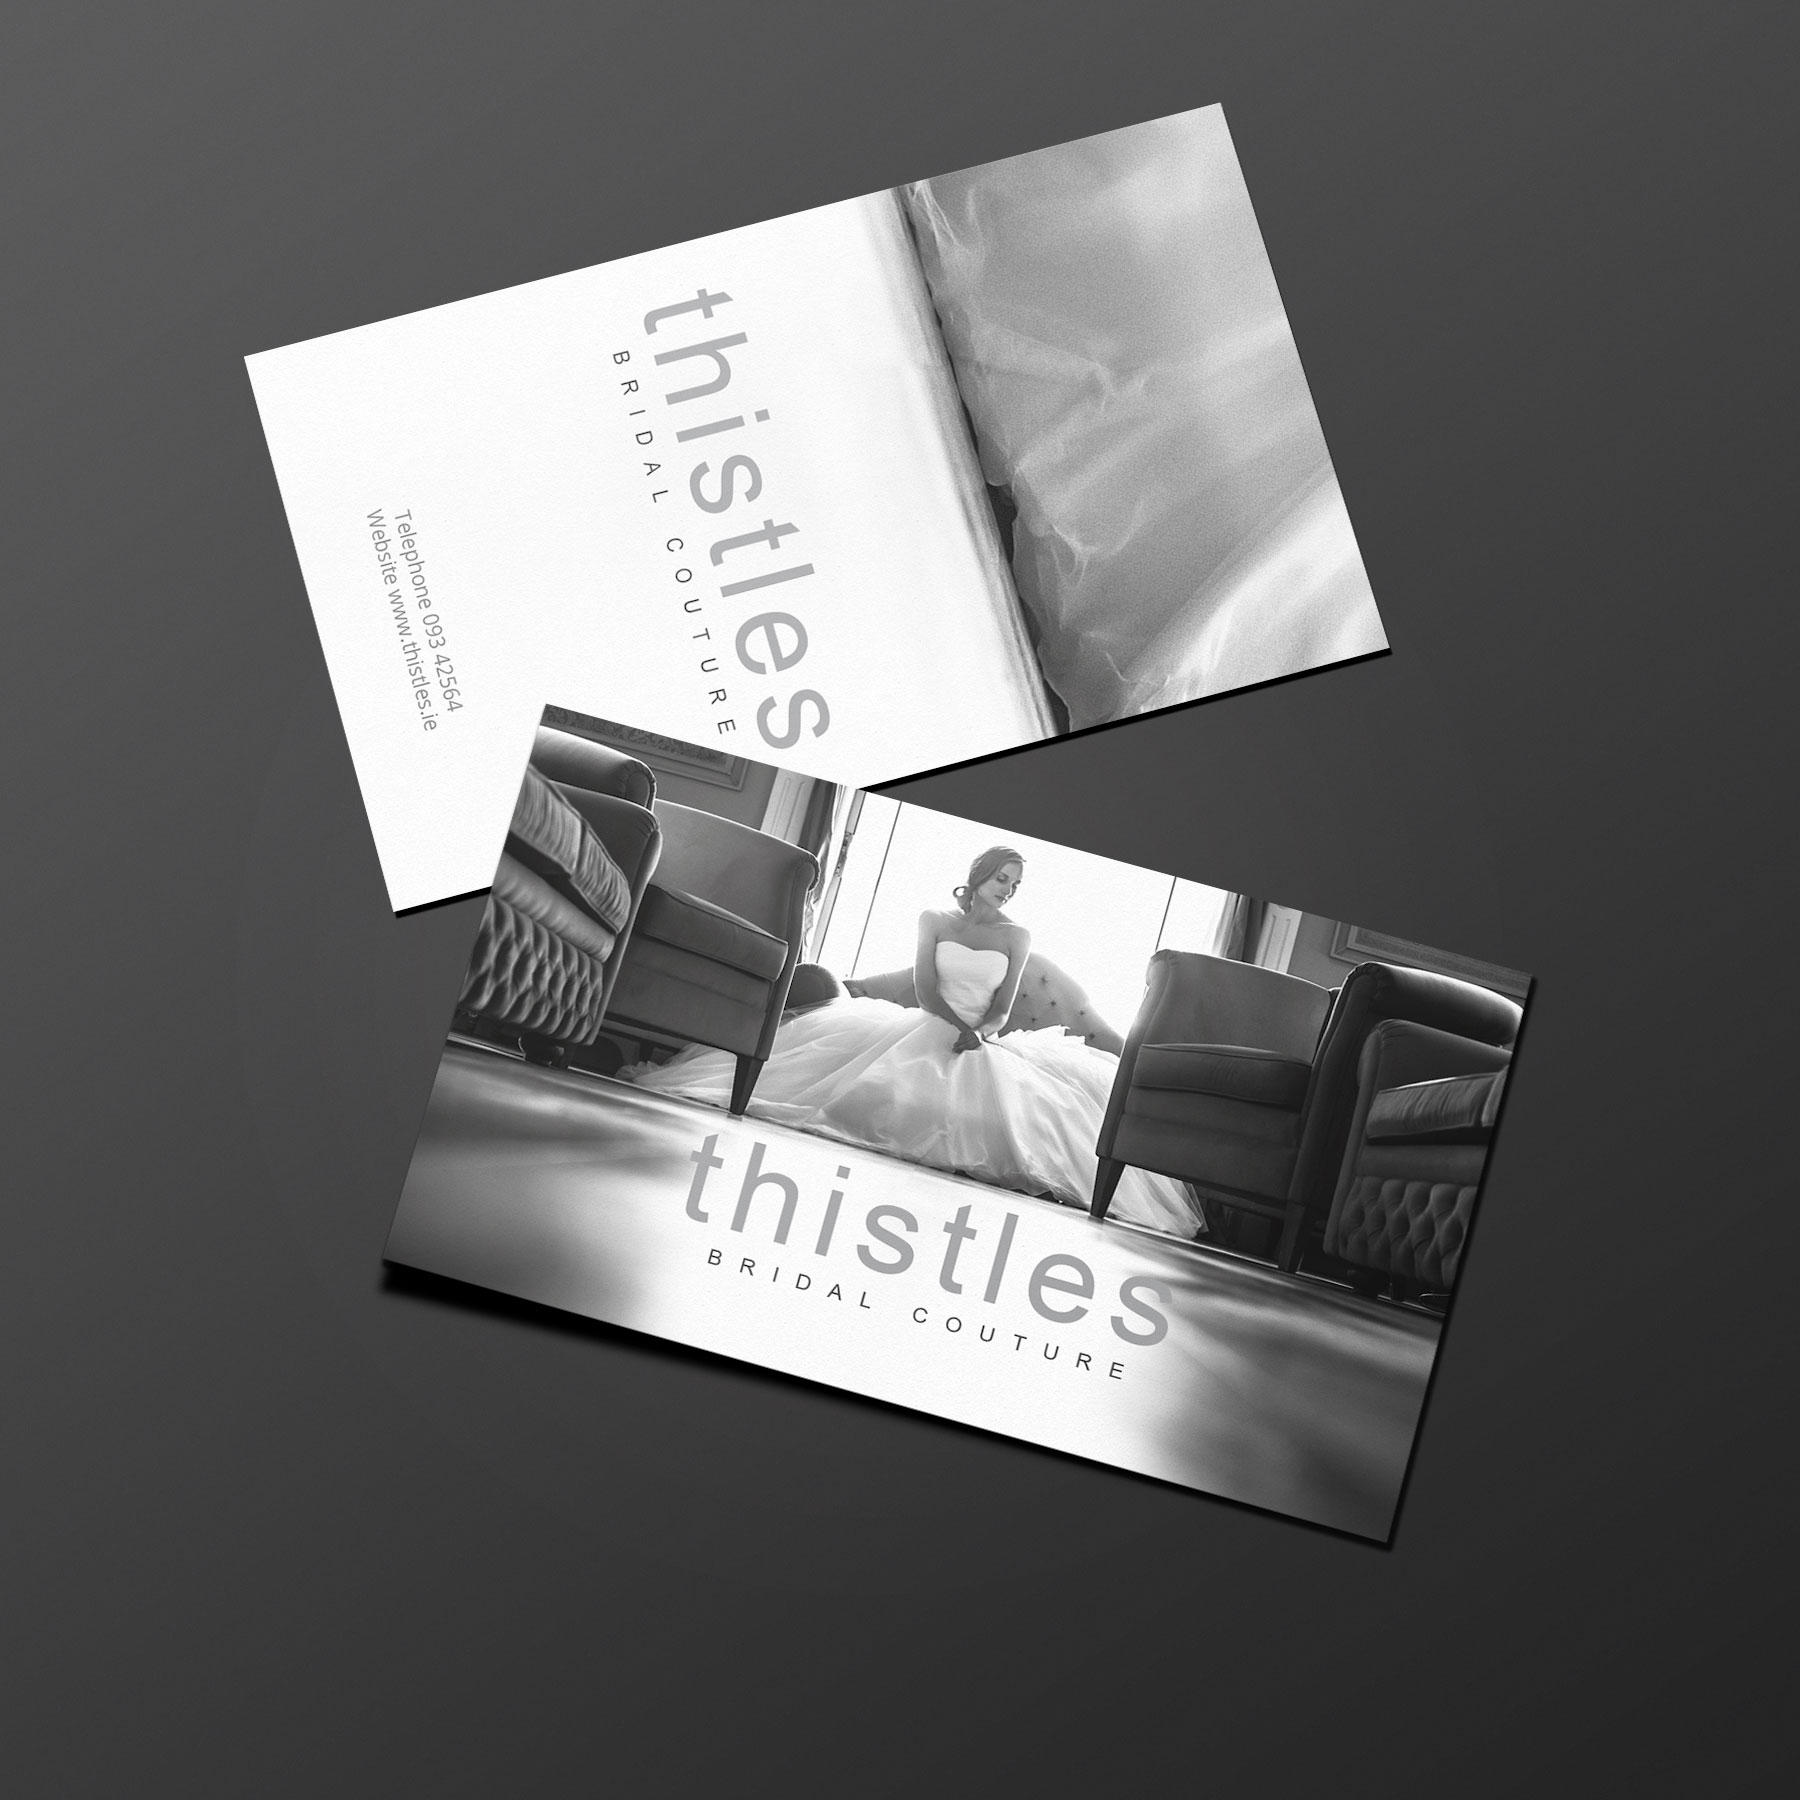 business cards designed by firesky studios